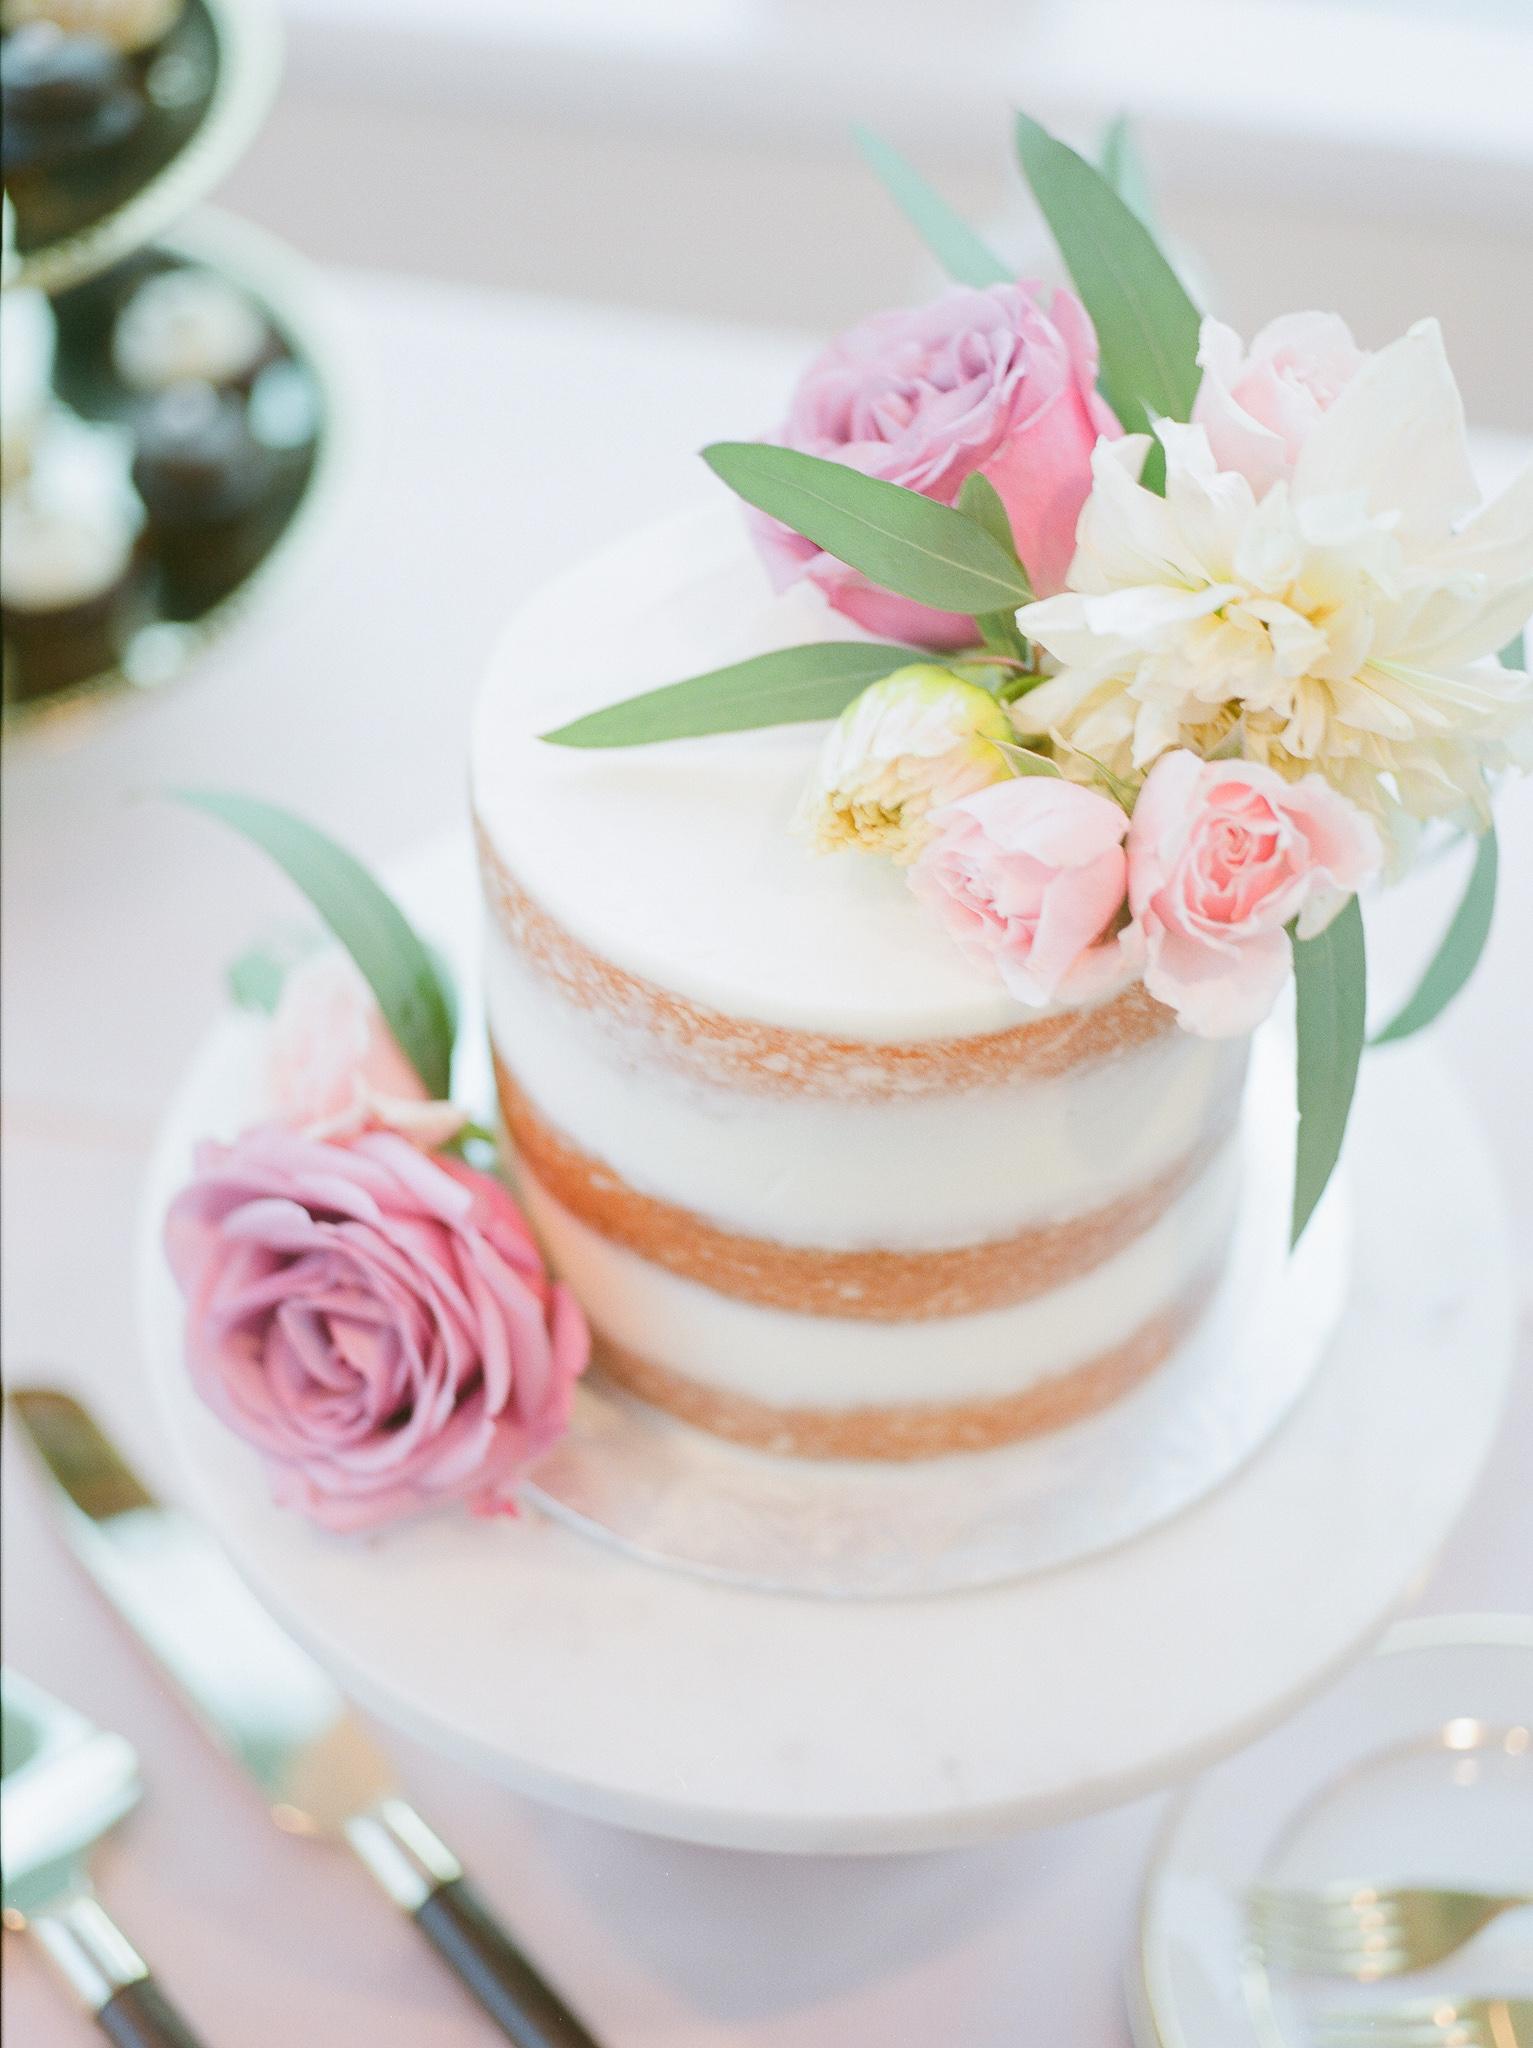 wedding semi-naked lemon cream pie cake with cut flowers